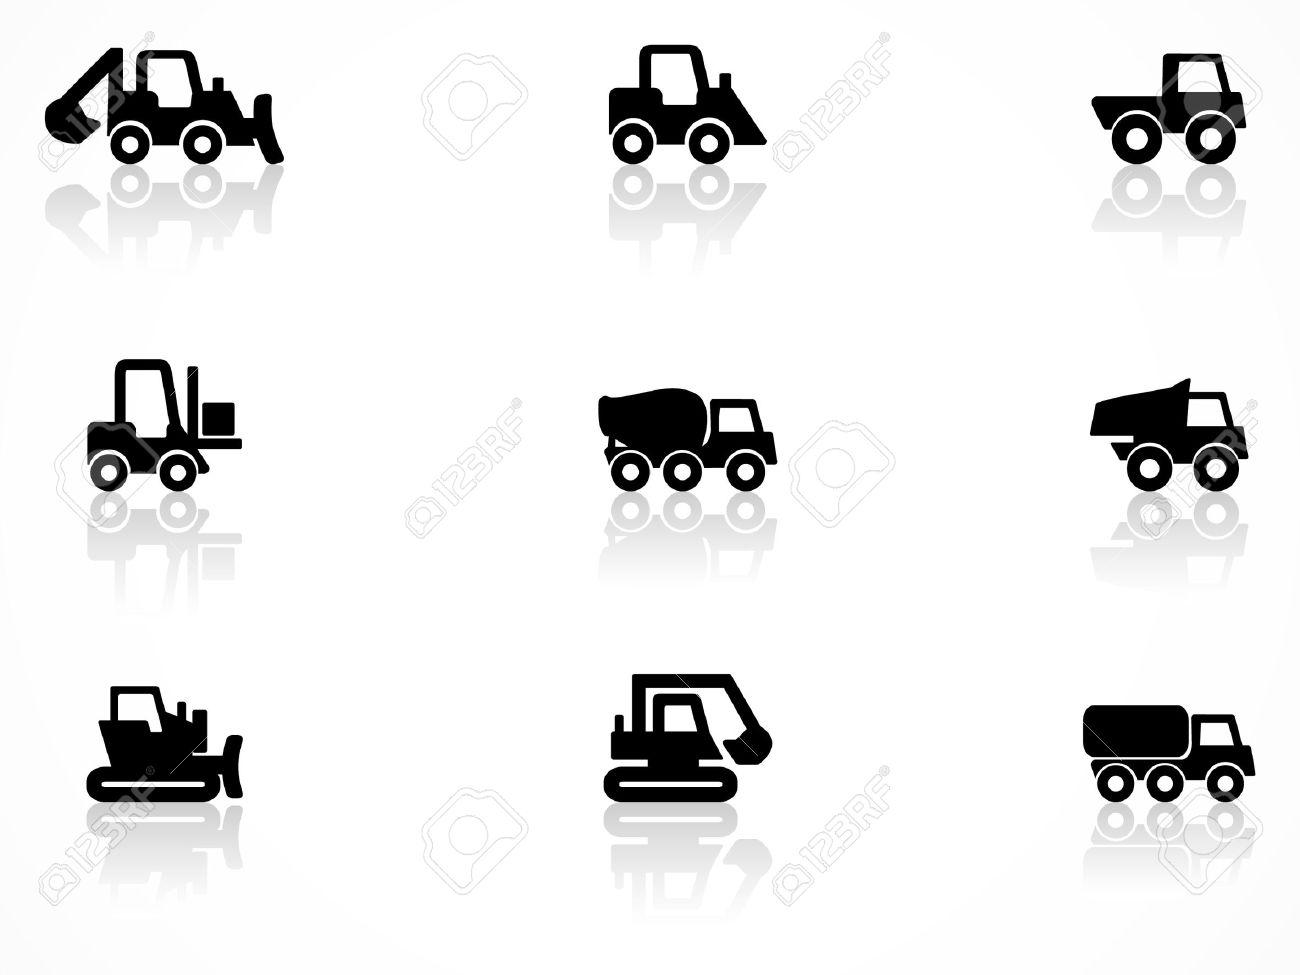 Construction Machines Symbols Royalty Free Cliparts, Vectors, And ...